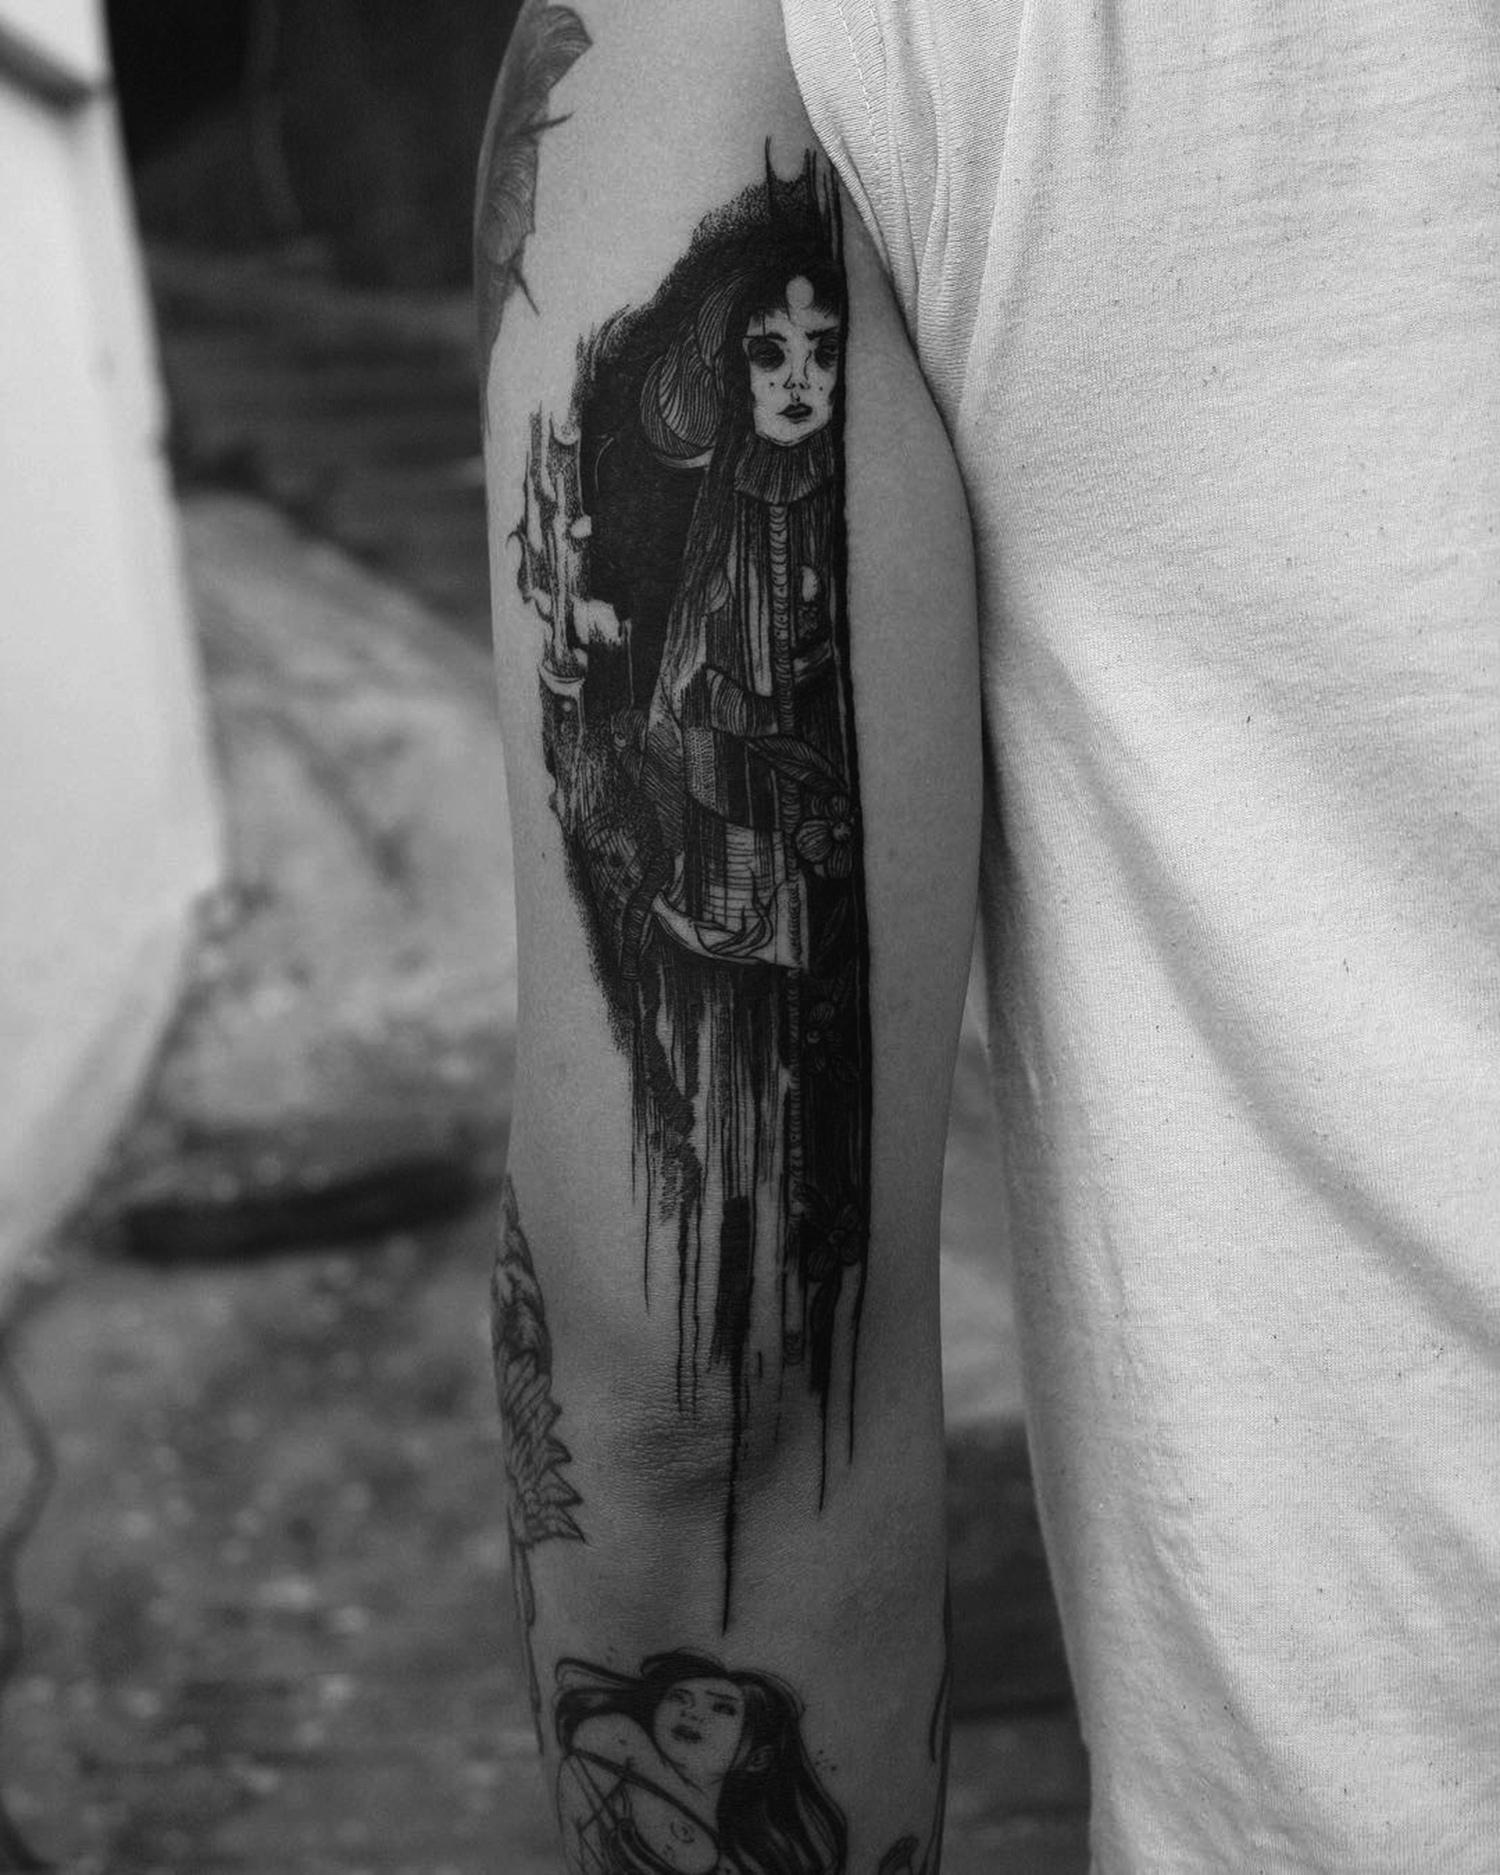 Suhwan Bak - Goth Gloomy tattoo - creepy ghost